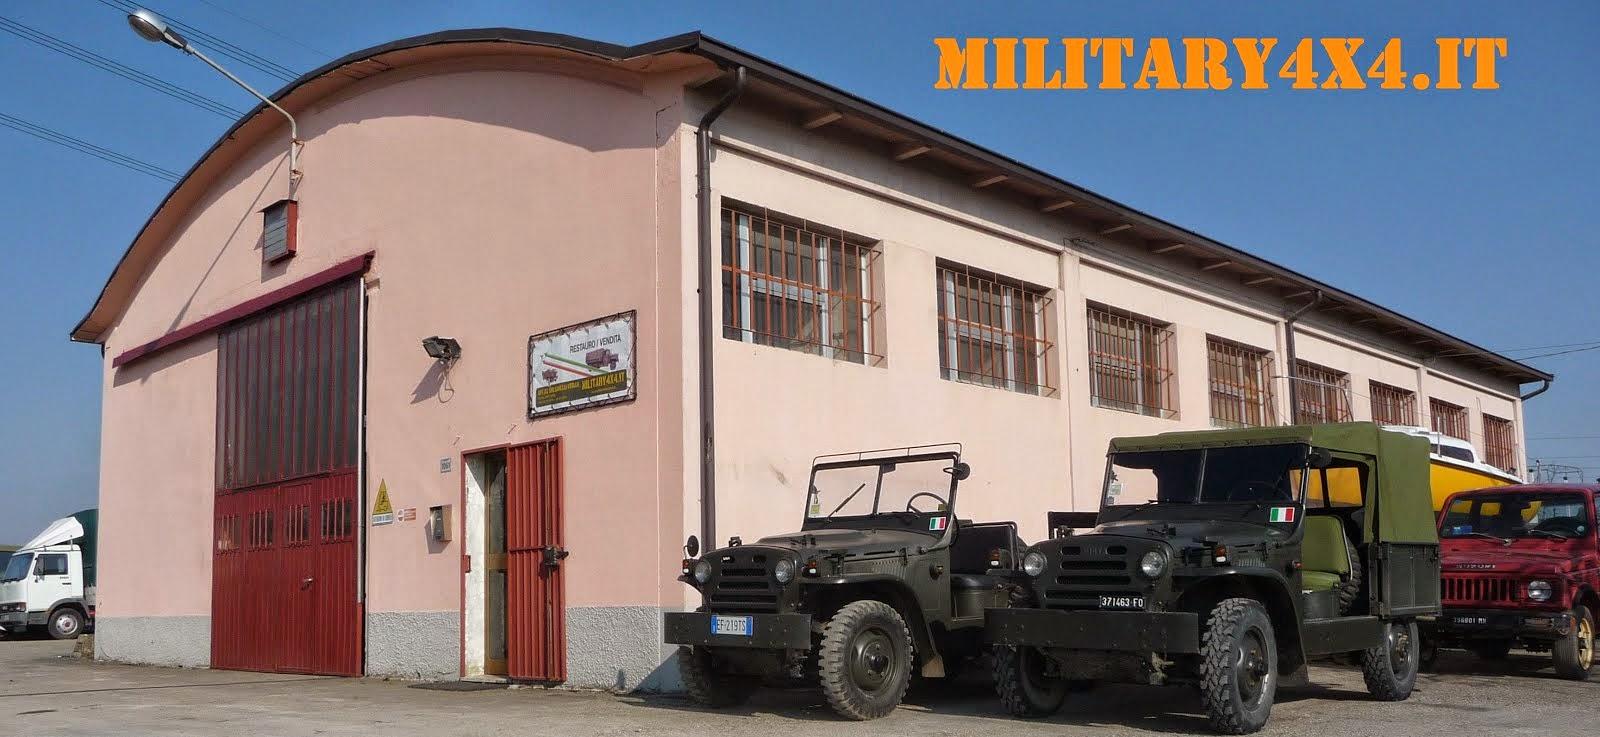 military4x4